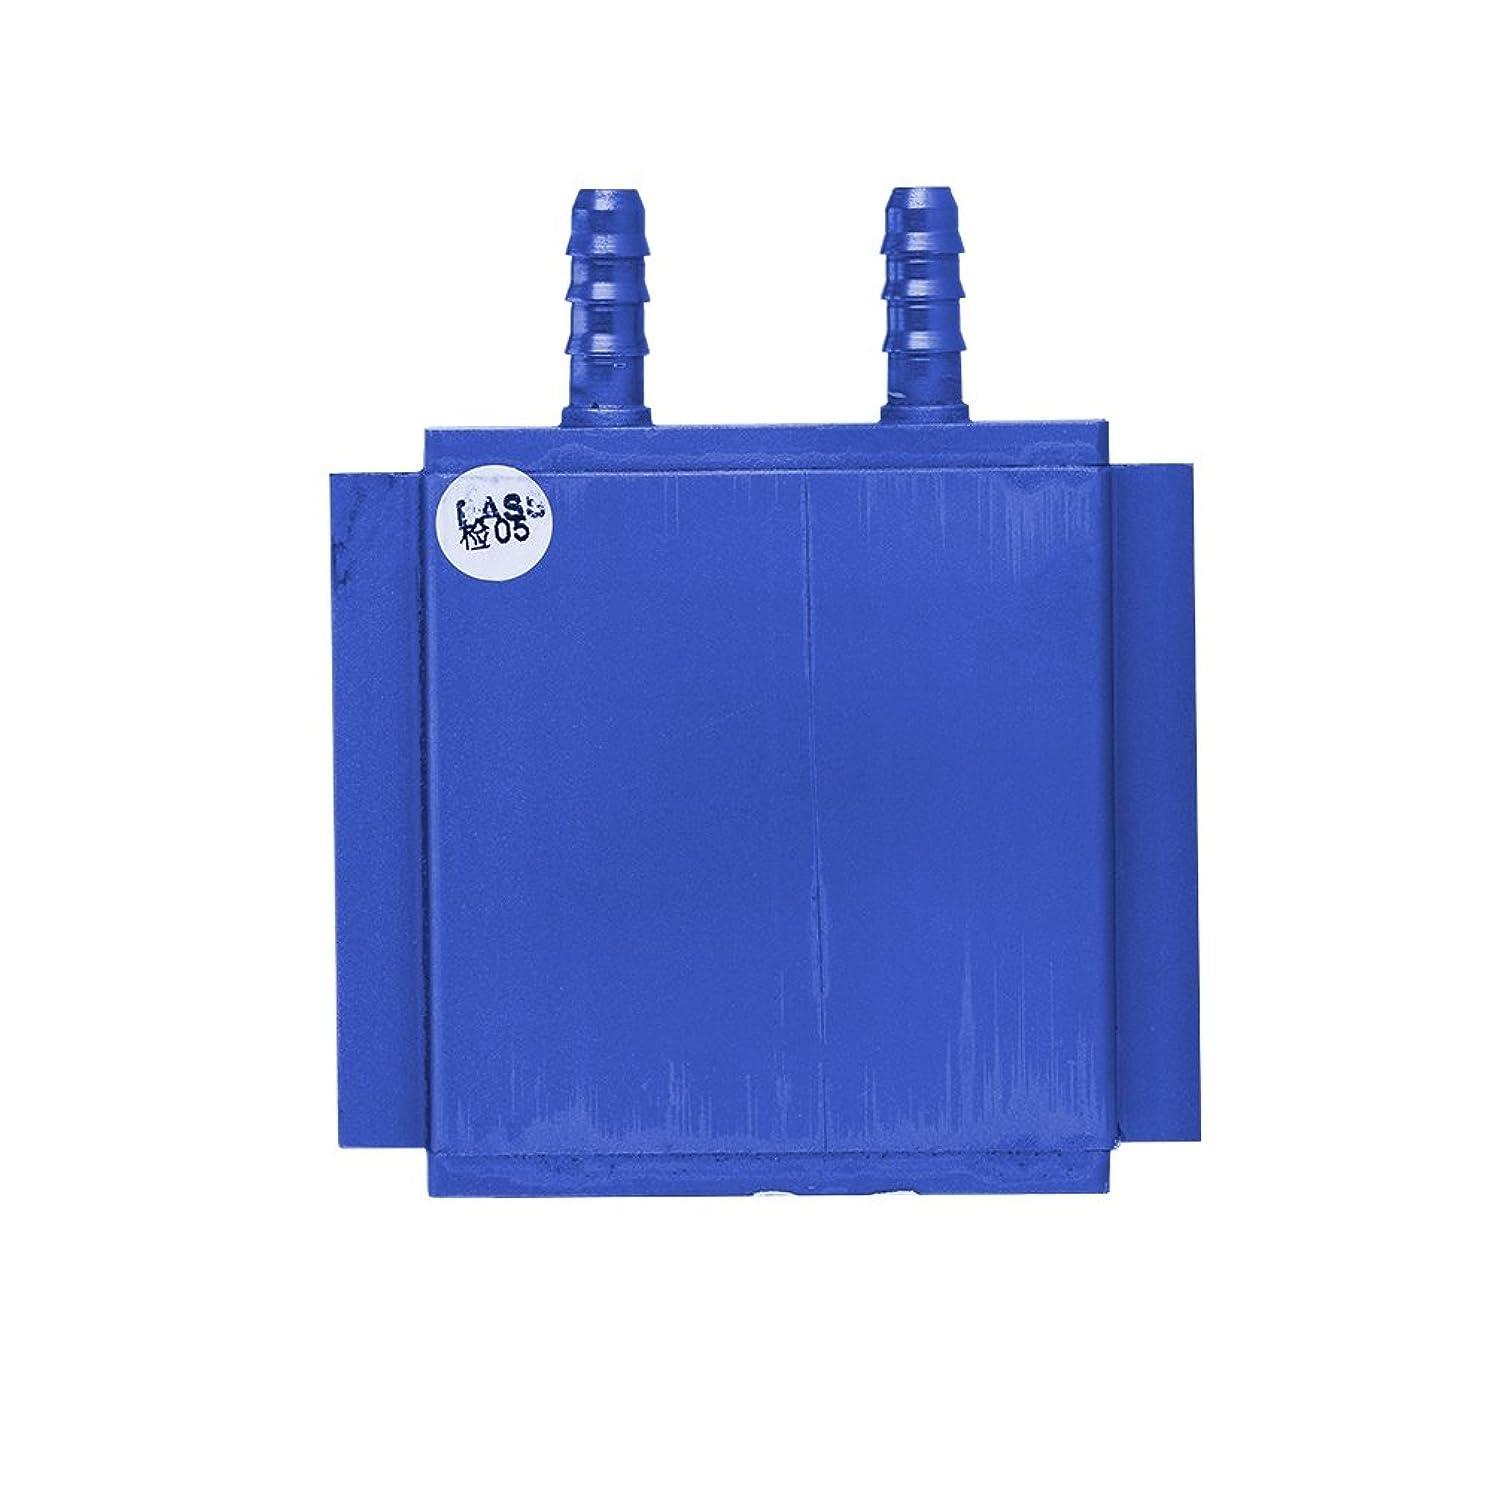 Bewinner Water Cooling Block for Heat Reducing 7.5mm Nozzle Aluminum Water Cooling Heatsink Block PC CPU North/South Bridge Cooler 74 x 68MM for Liquid Water Cooler Heat Sink System